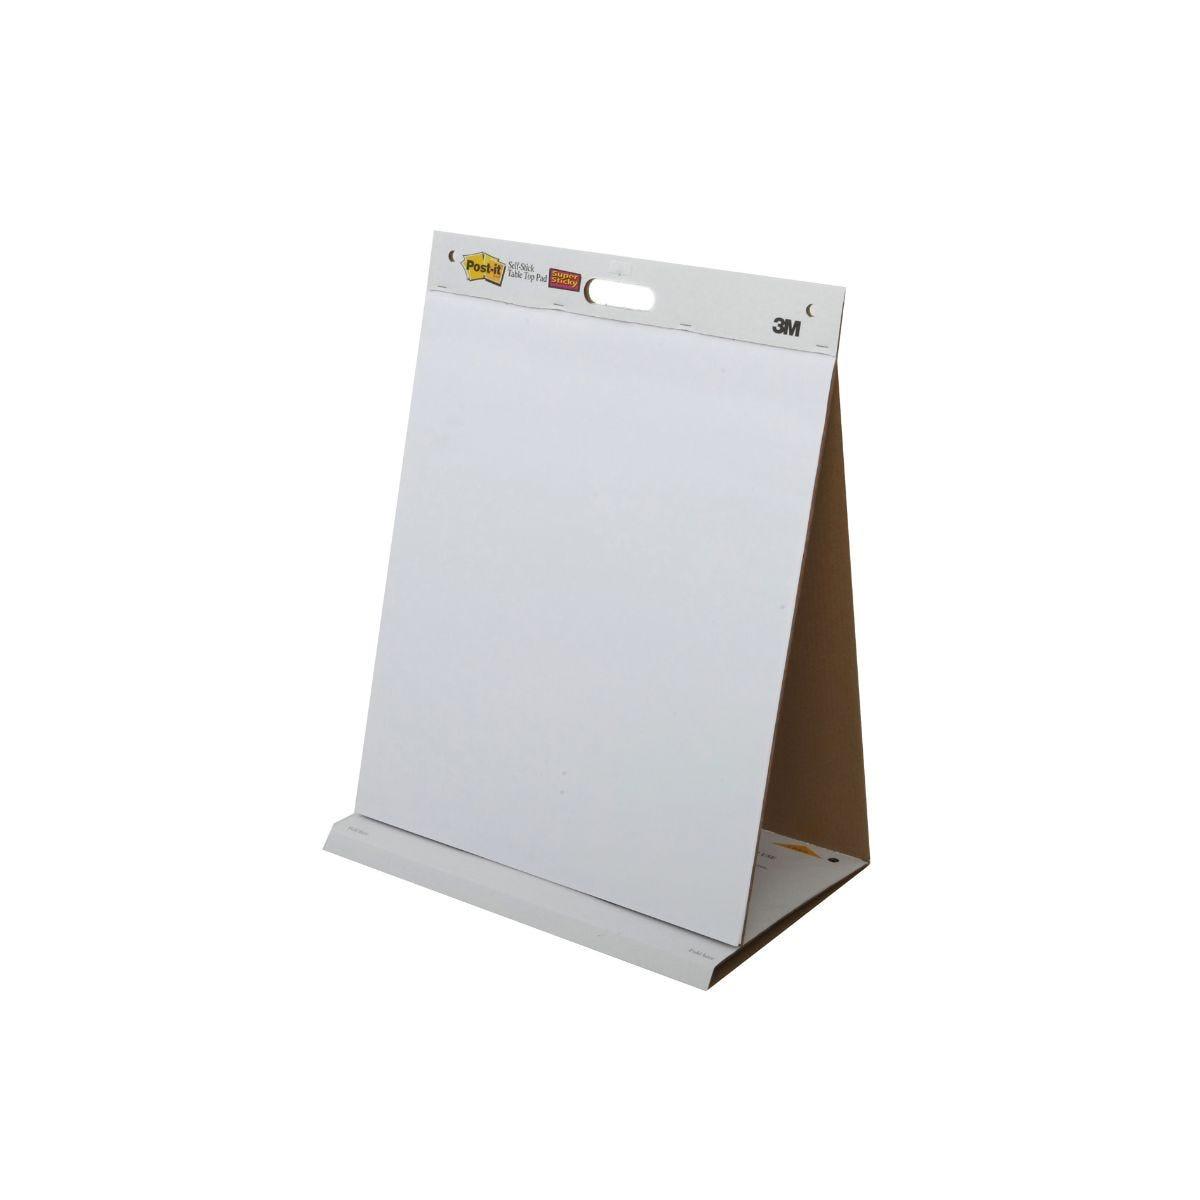 Image of 3M Post-It Flip Chart Pad 20 Sheets